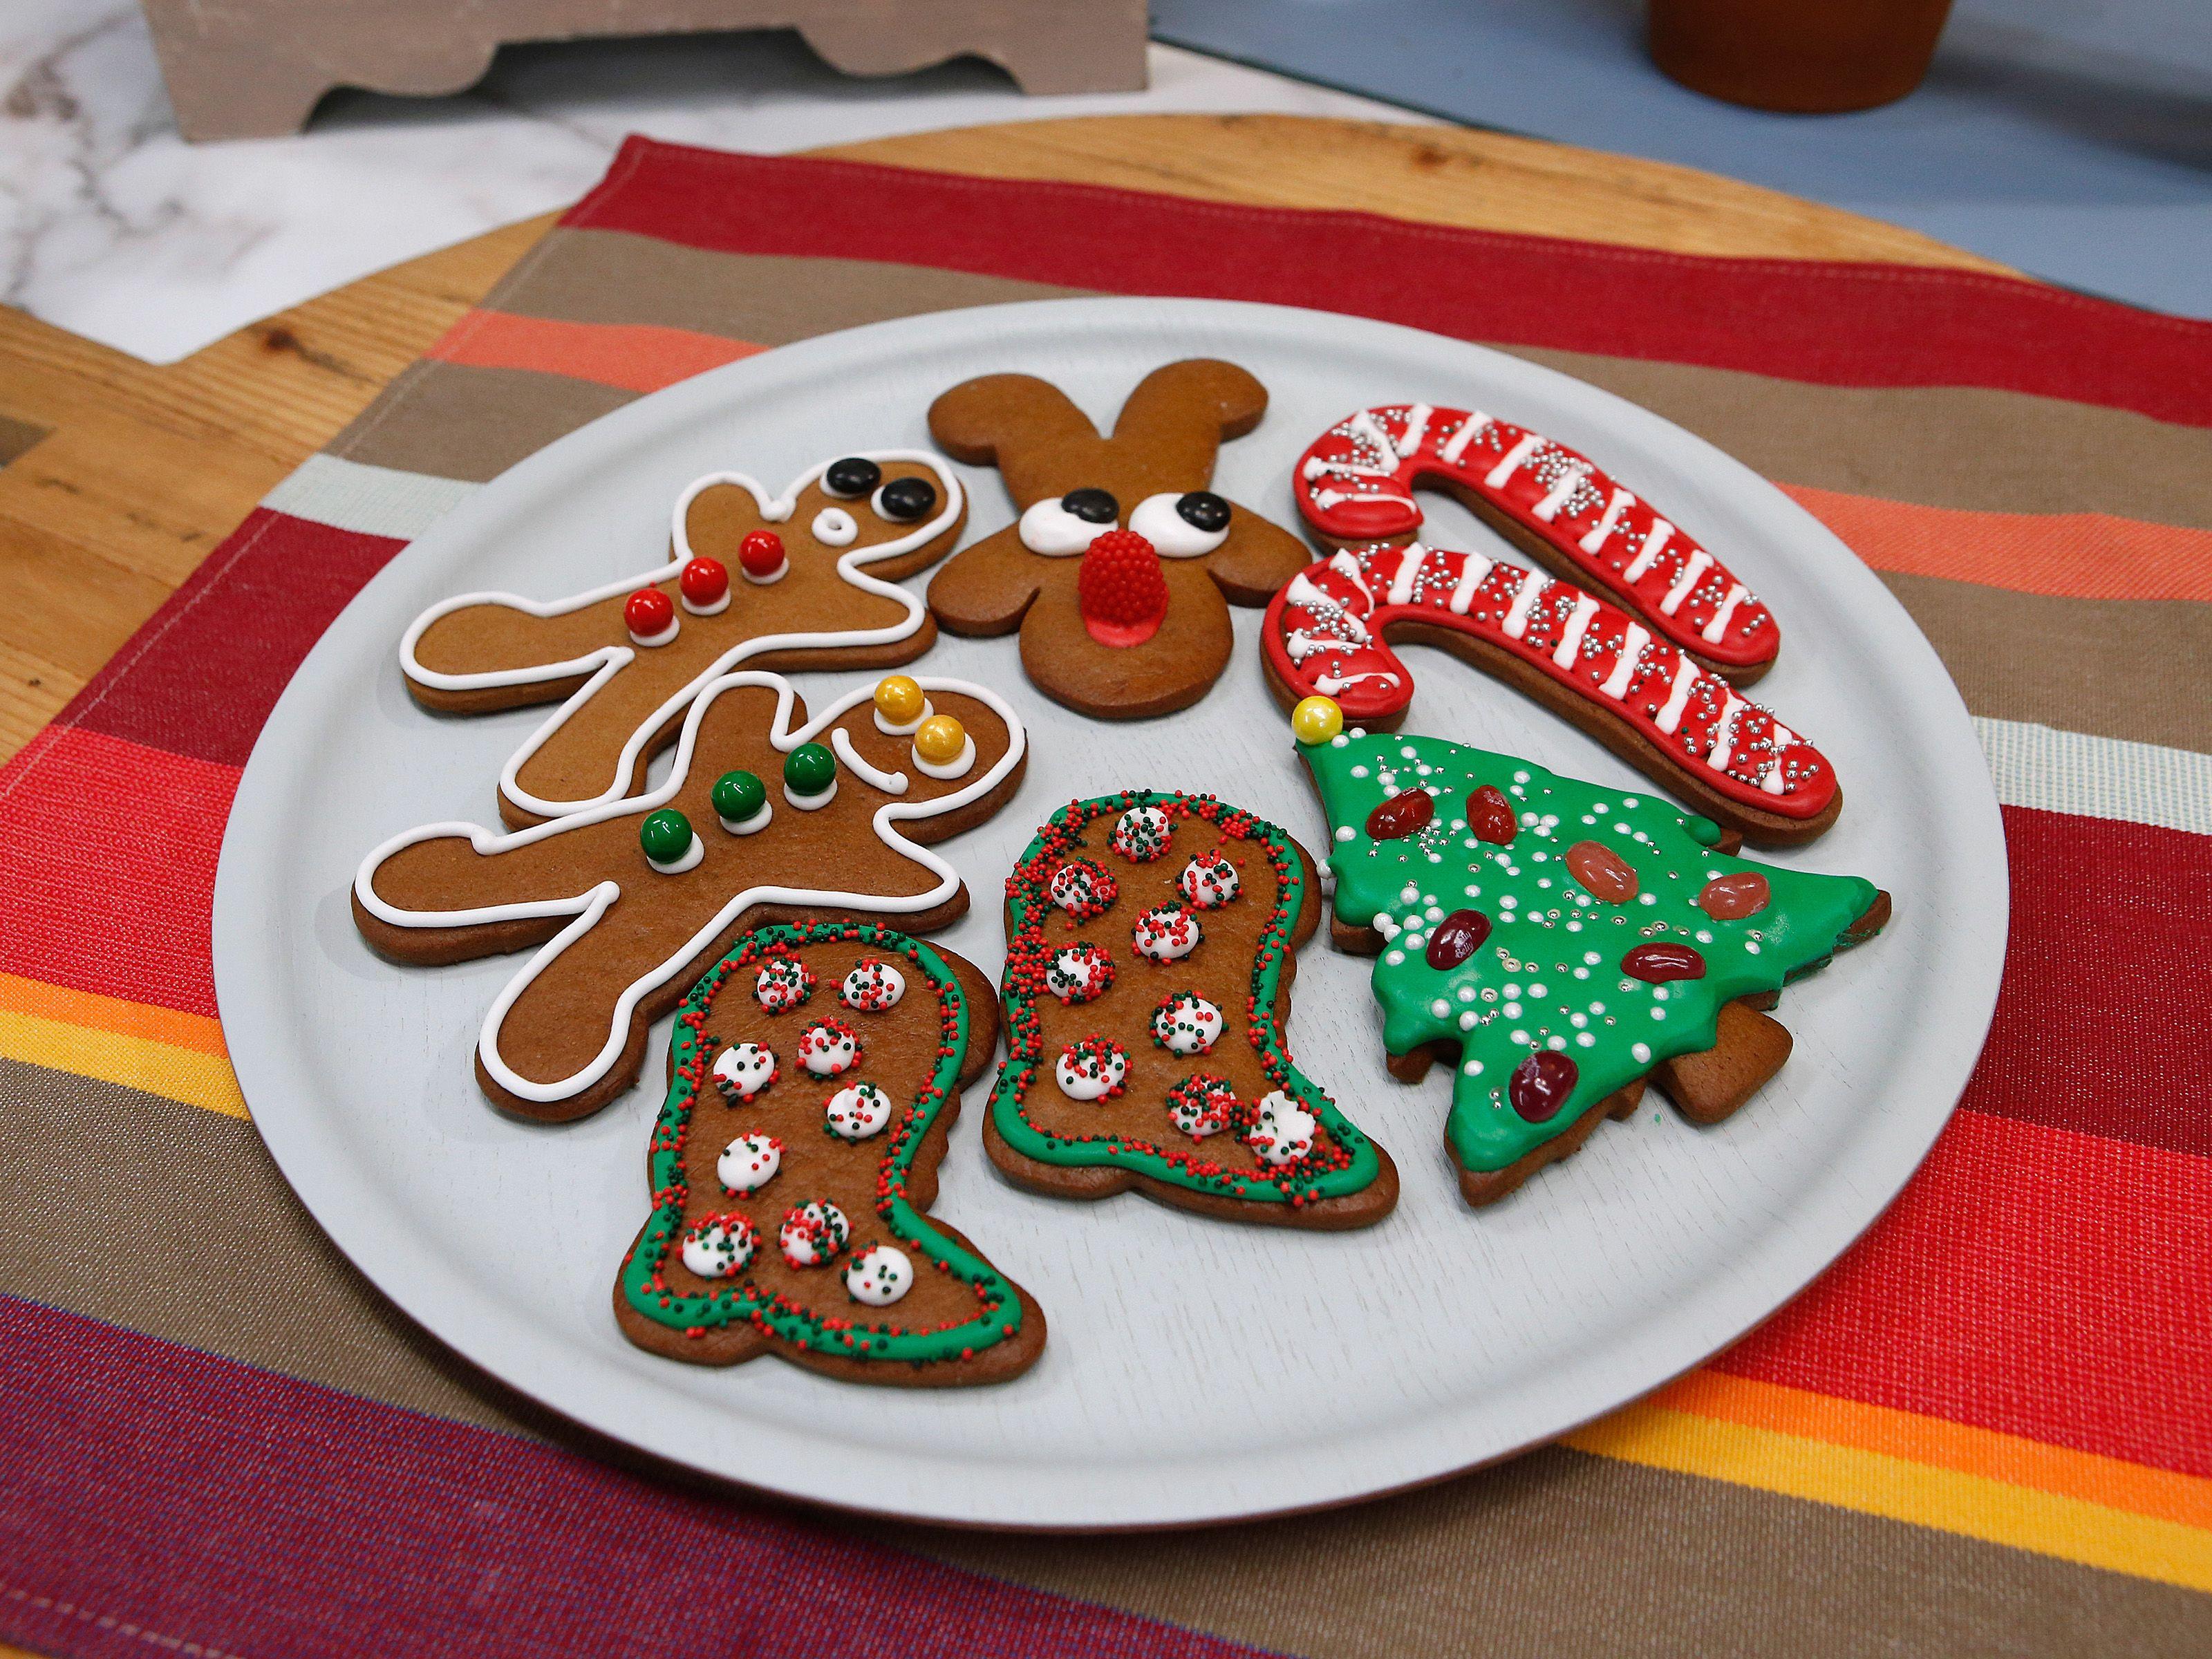 Gingerbread cookies recipe cookie recipes gingerbread and food cookie monster gingerbread cookies recipe from duff goldman via food network forumfinder Gallery